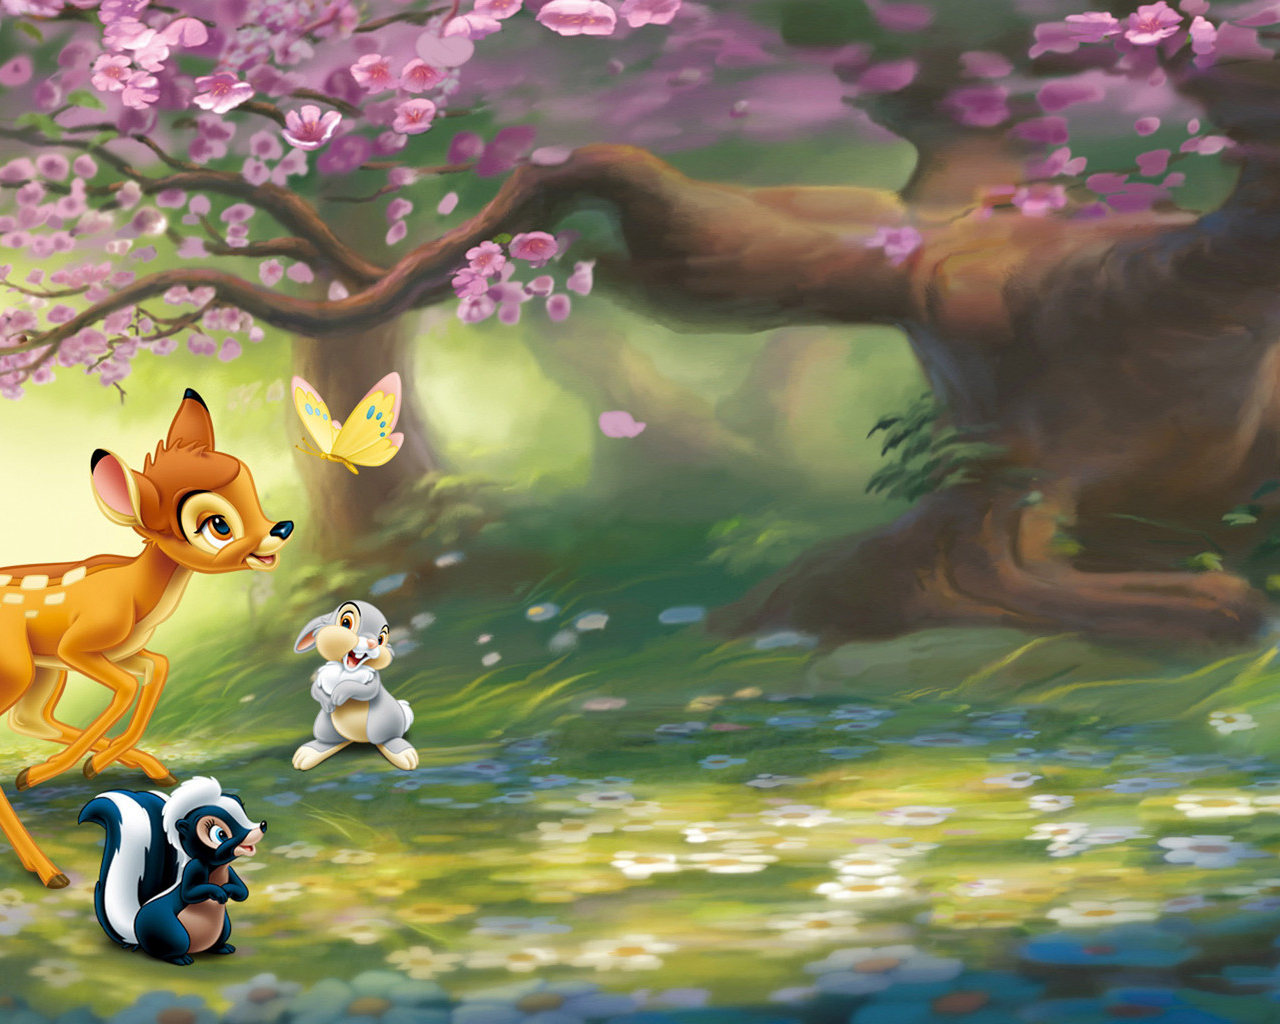 Cute cartoon animal wallpapers for desktop